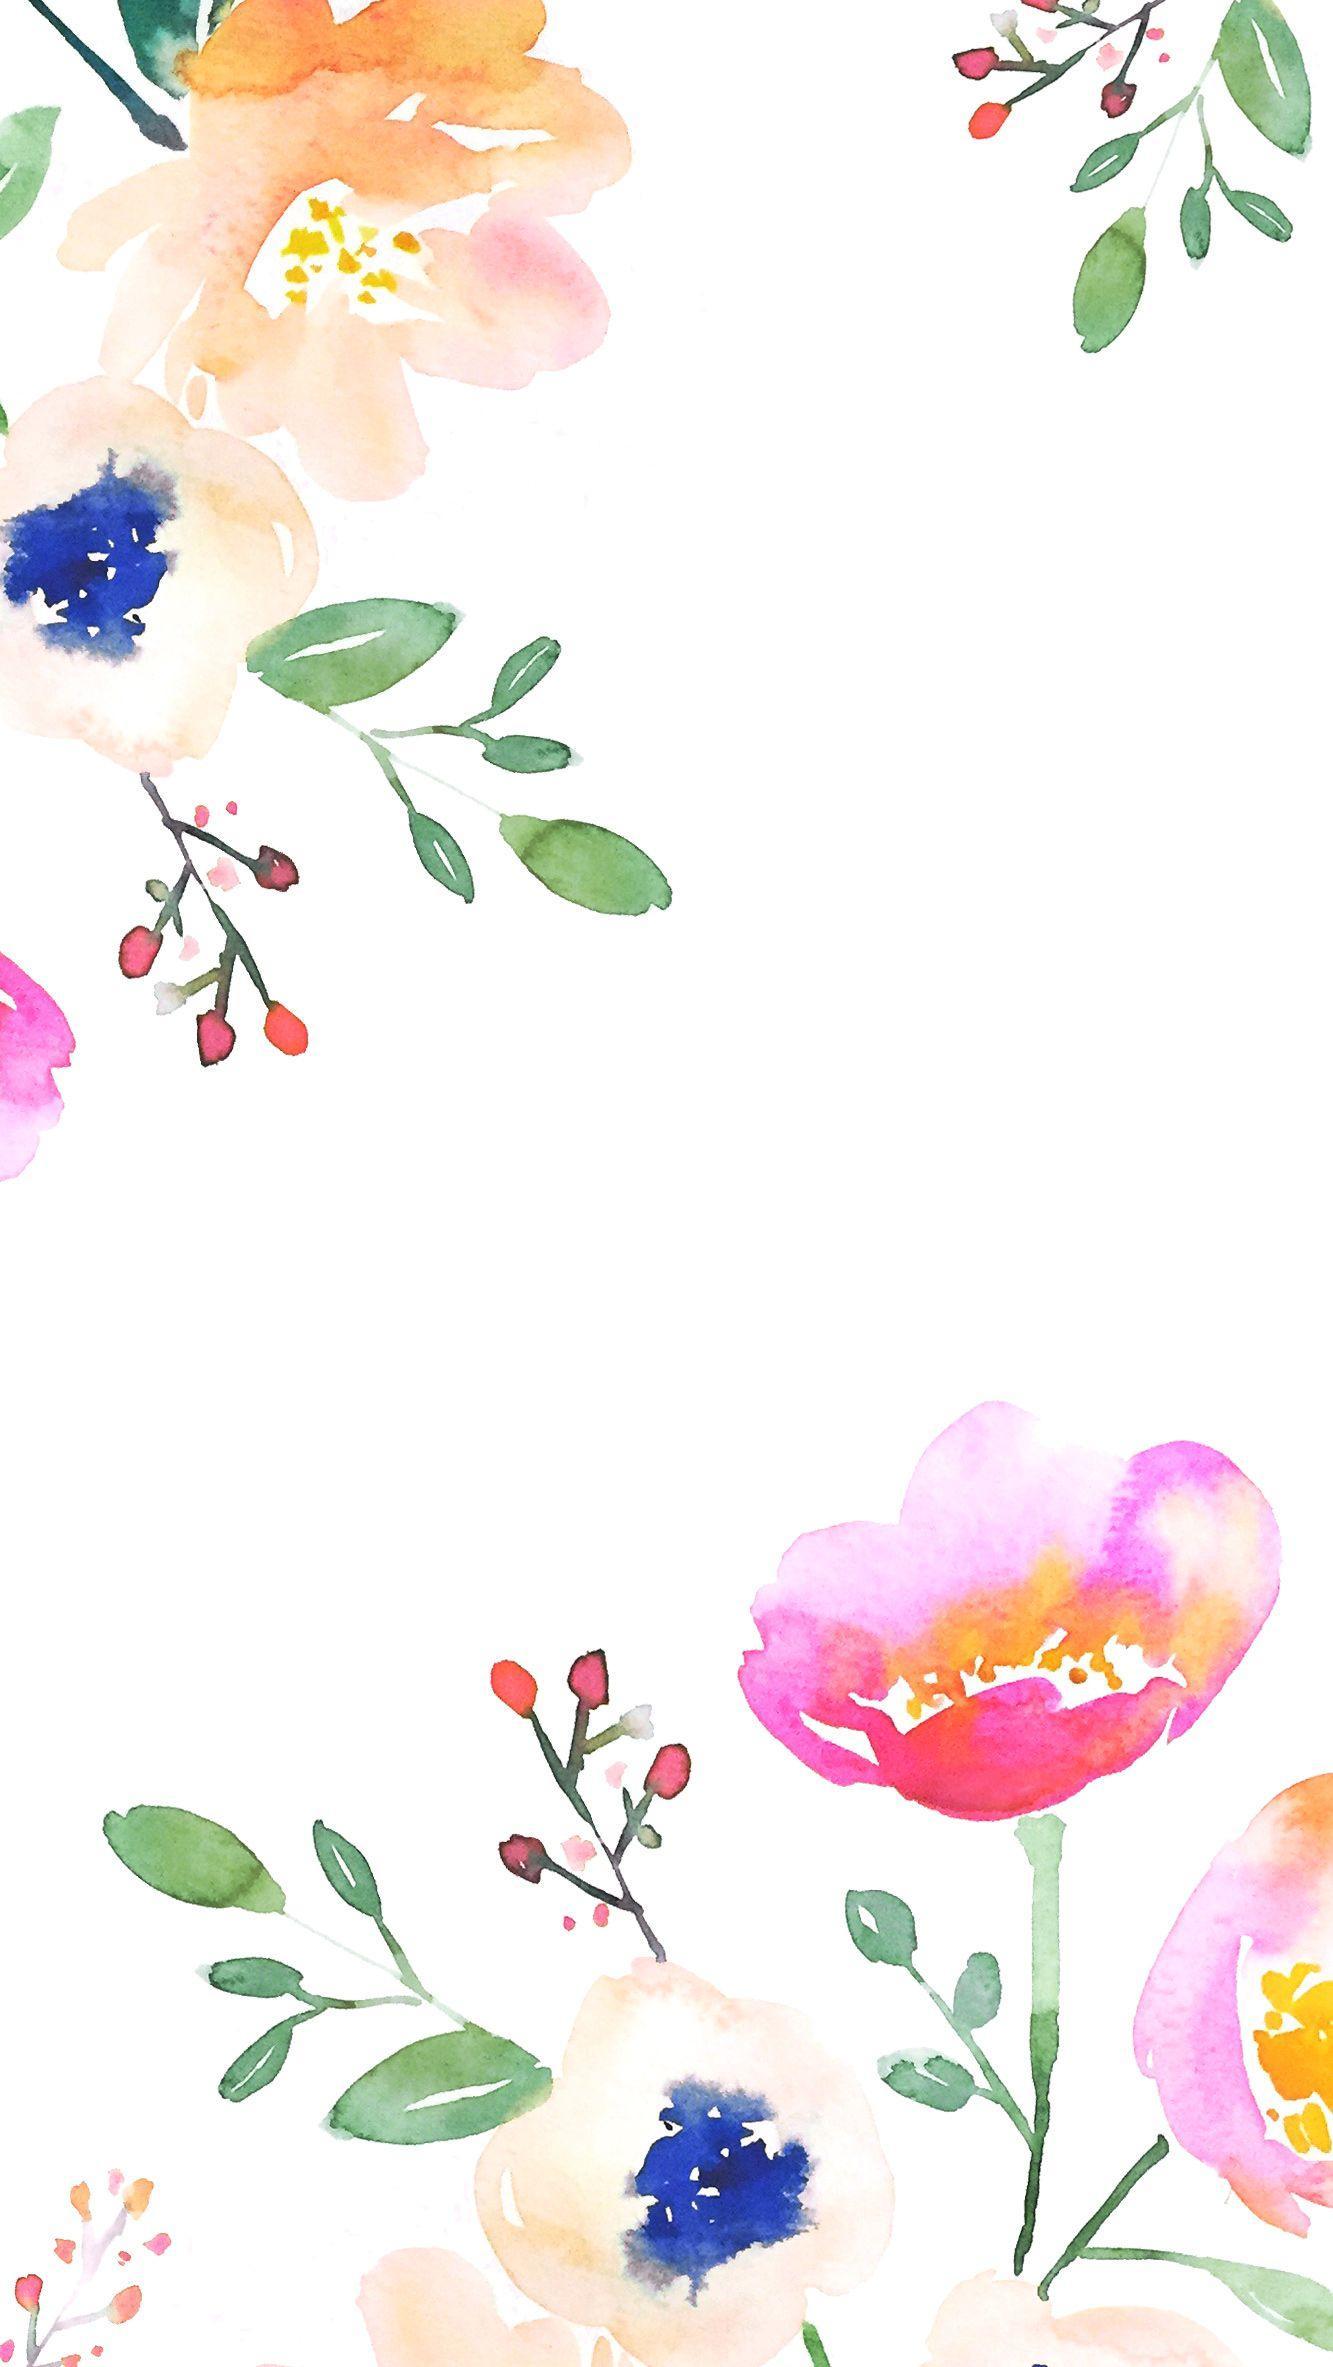 Watercolor Flower Iphone Wallpapers Top Free Watercolor Flower